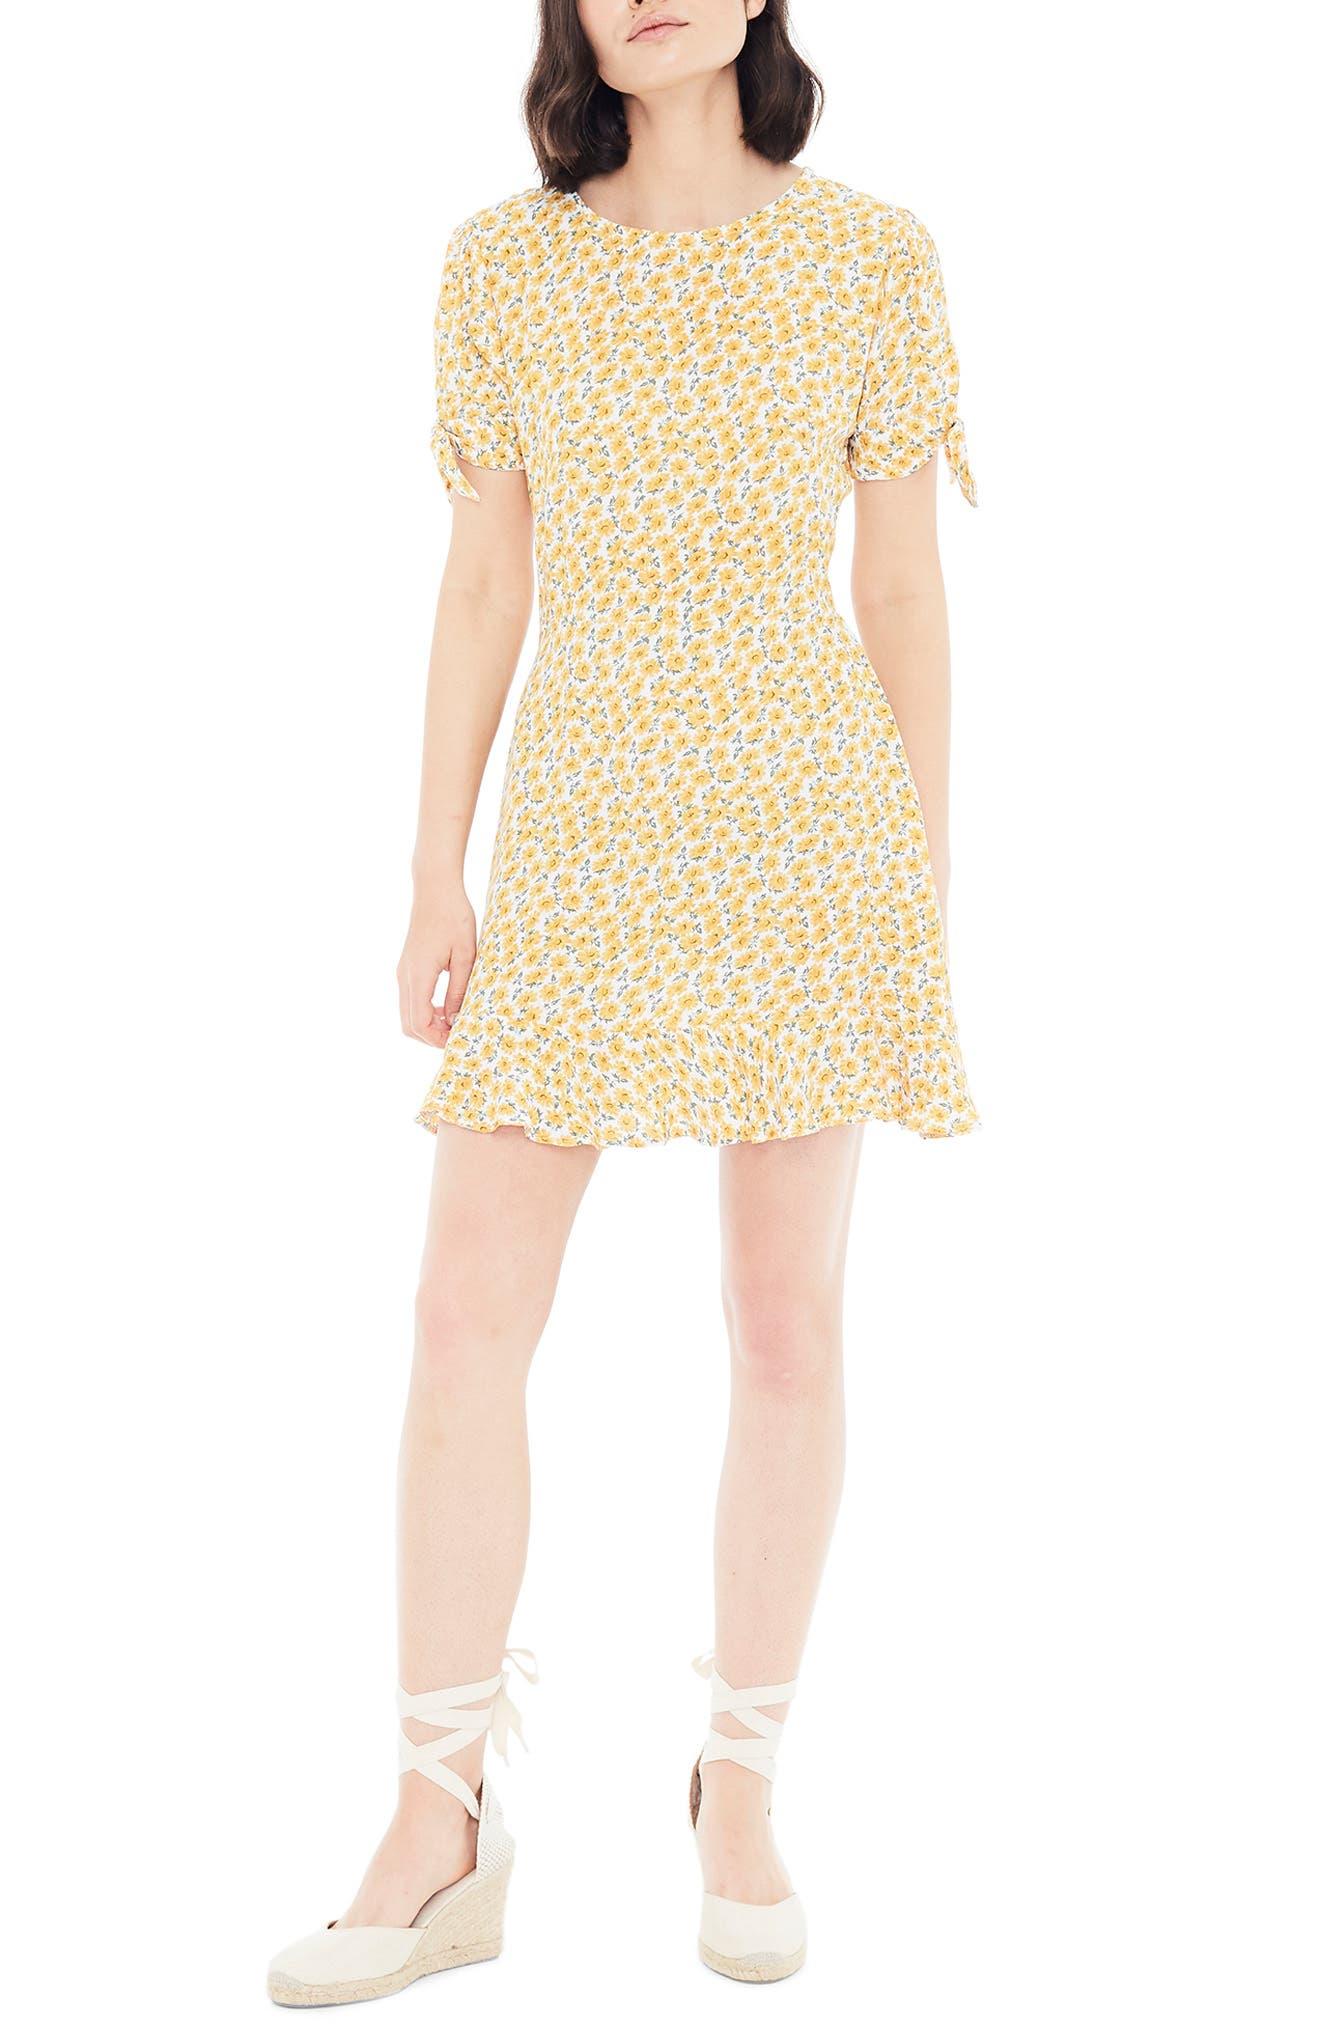 Daphne Tie Sleeve Minidress, Main, color, MARGUERITE FLORAL - YELLOW